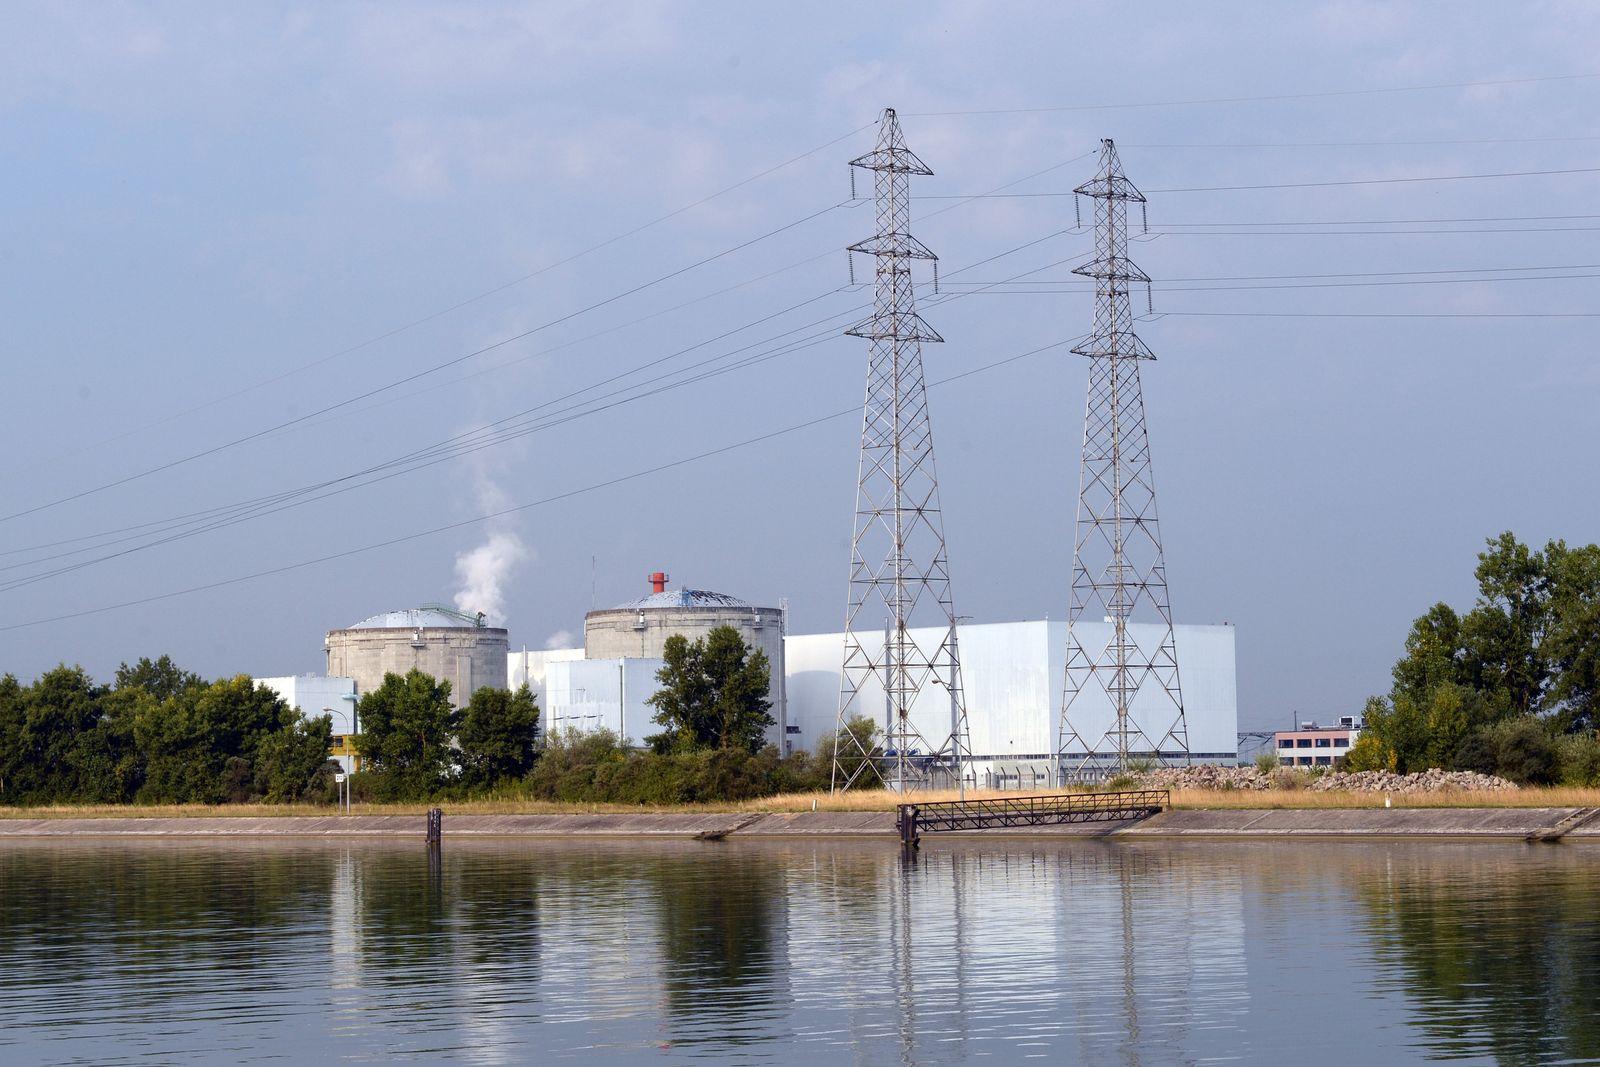 Atromkraftwerk Fessenheim